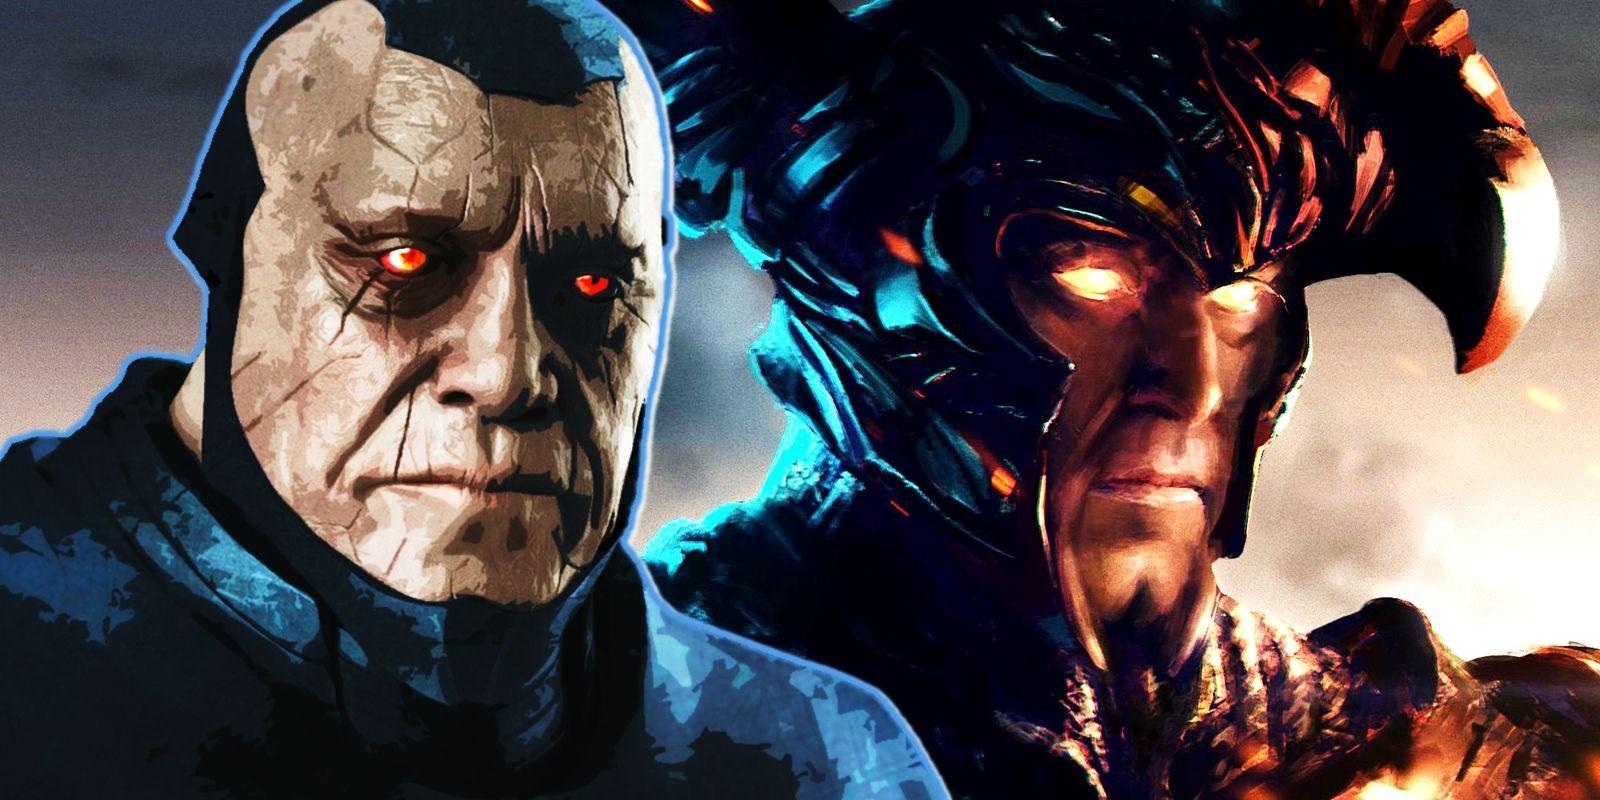 Justice League Movie Image Reveals Zack Snyder's Darkseid